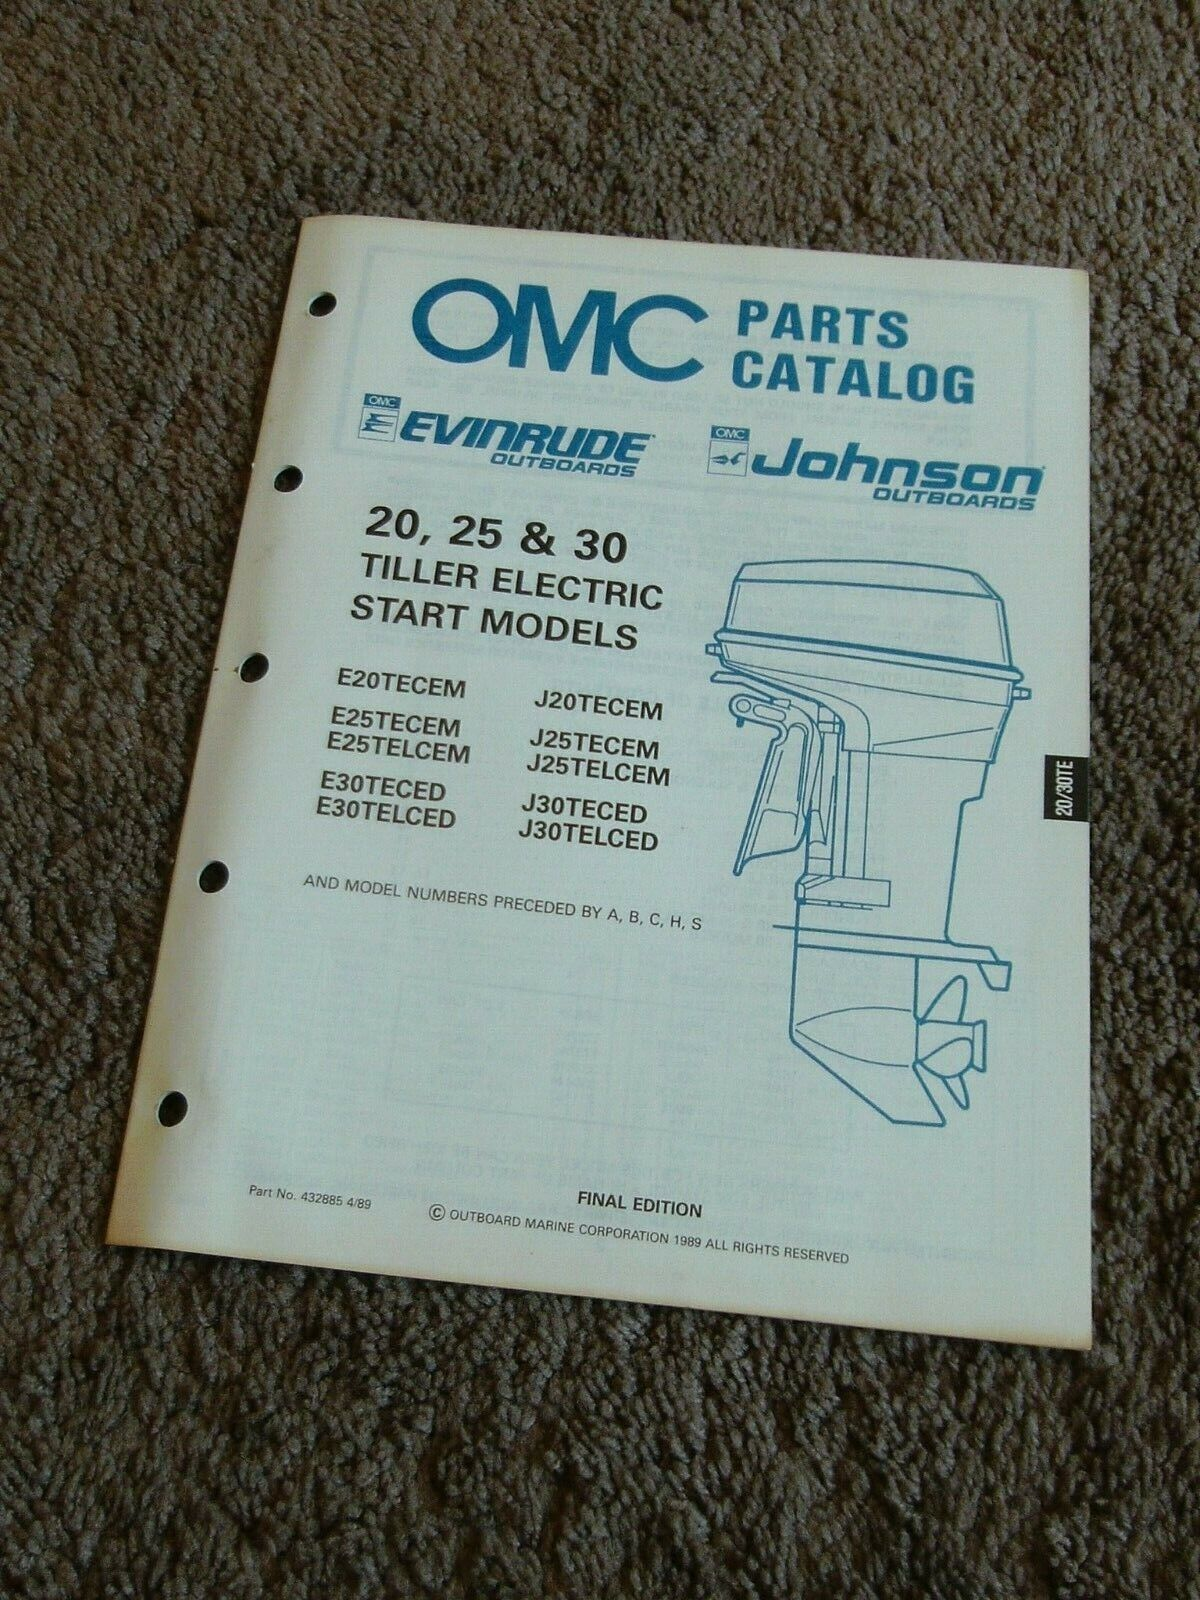 1989 OMC Evinrude Johnson Parts Catalog Manual 20 25 30 HP Tiller Electric Start